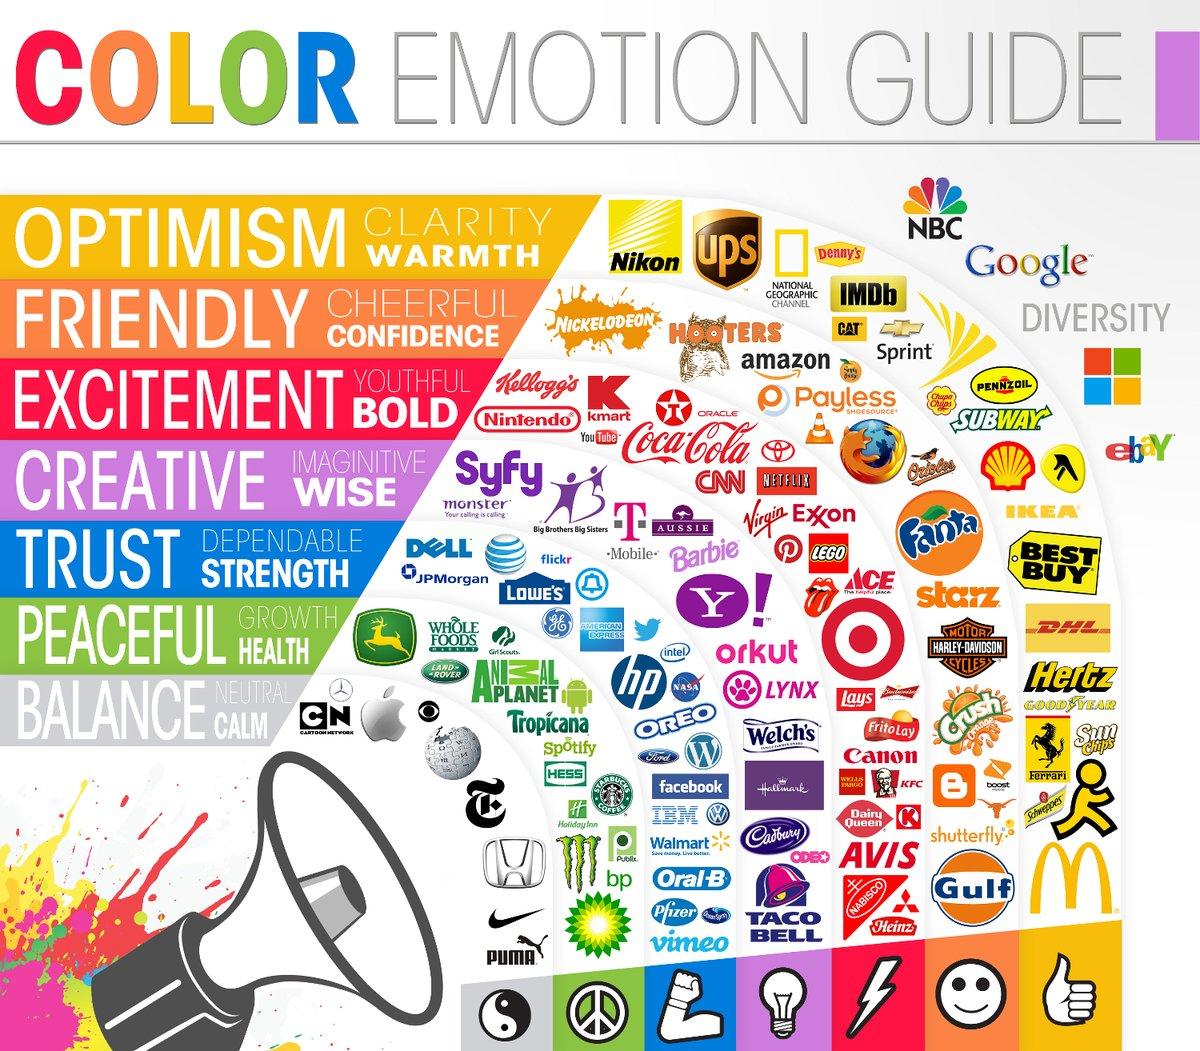 Here is what color means and how big brands use it! __ #Internet #DigitalMarketing #InternetMarketing #SocialMedia #SEO #SMM #Mpgvip #defstar5 #BigData #bitcoin #Digital #startup #marketing #ArtificialIntelligence #DataScience #Fintech #innovation #ThursdayThoughts  #kartbuddy<br>http://pic.twitter.com/H7Lh0qoU5T